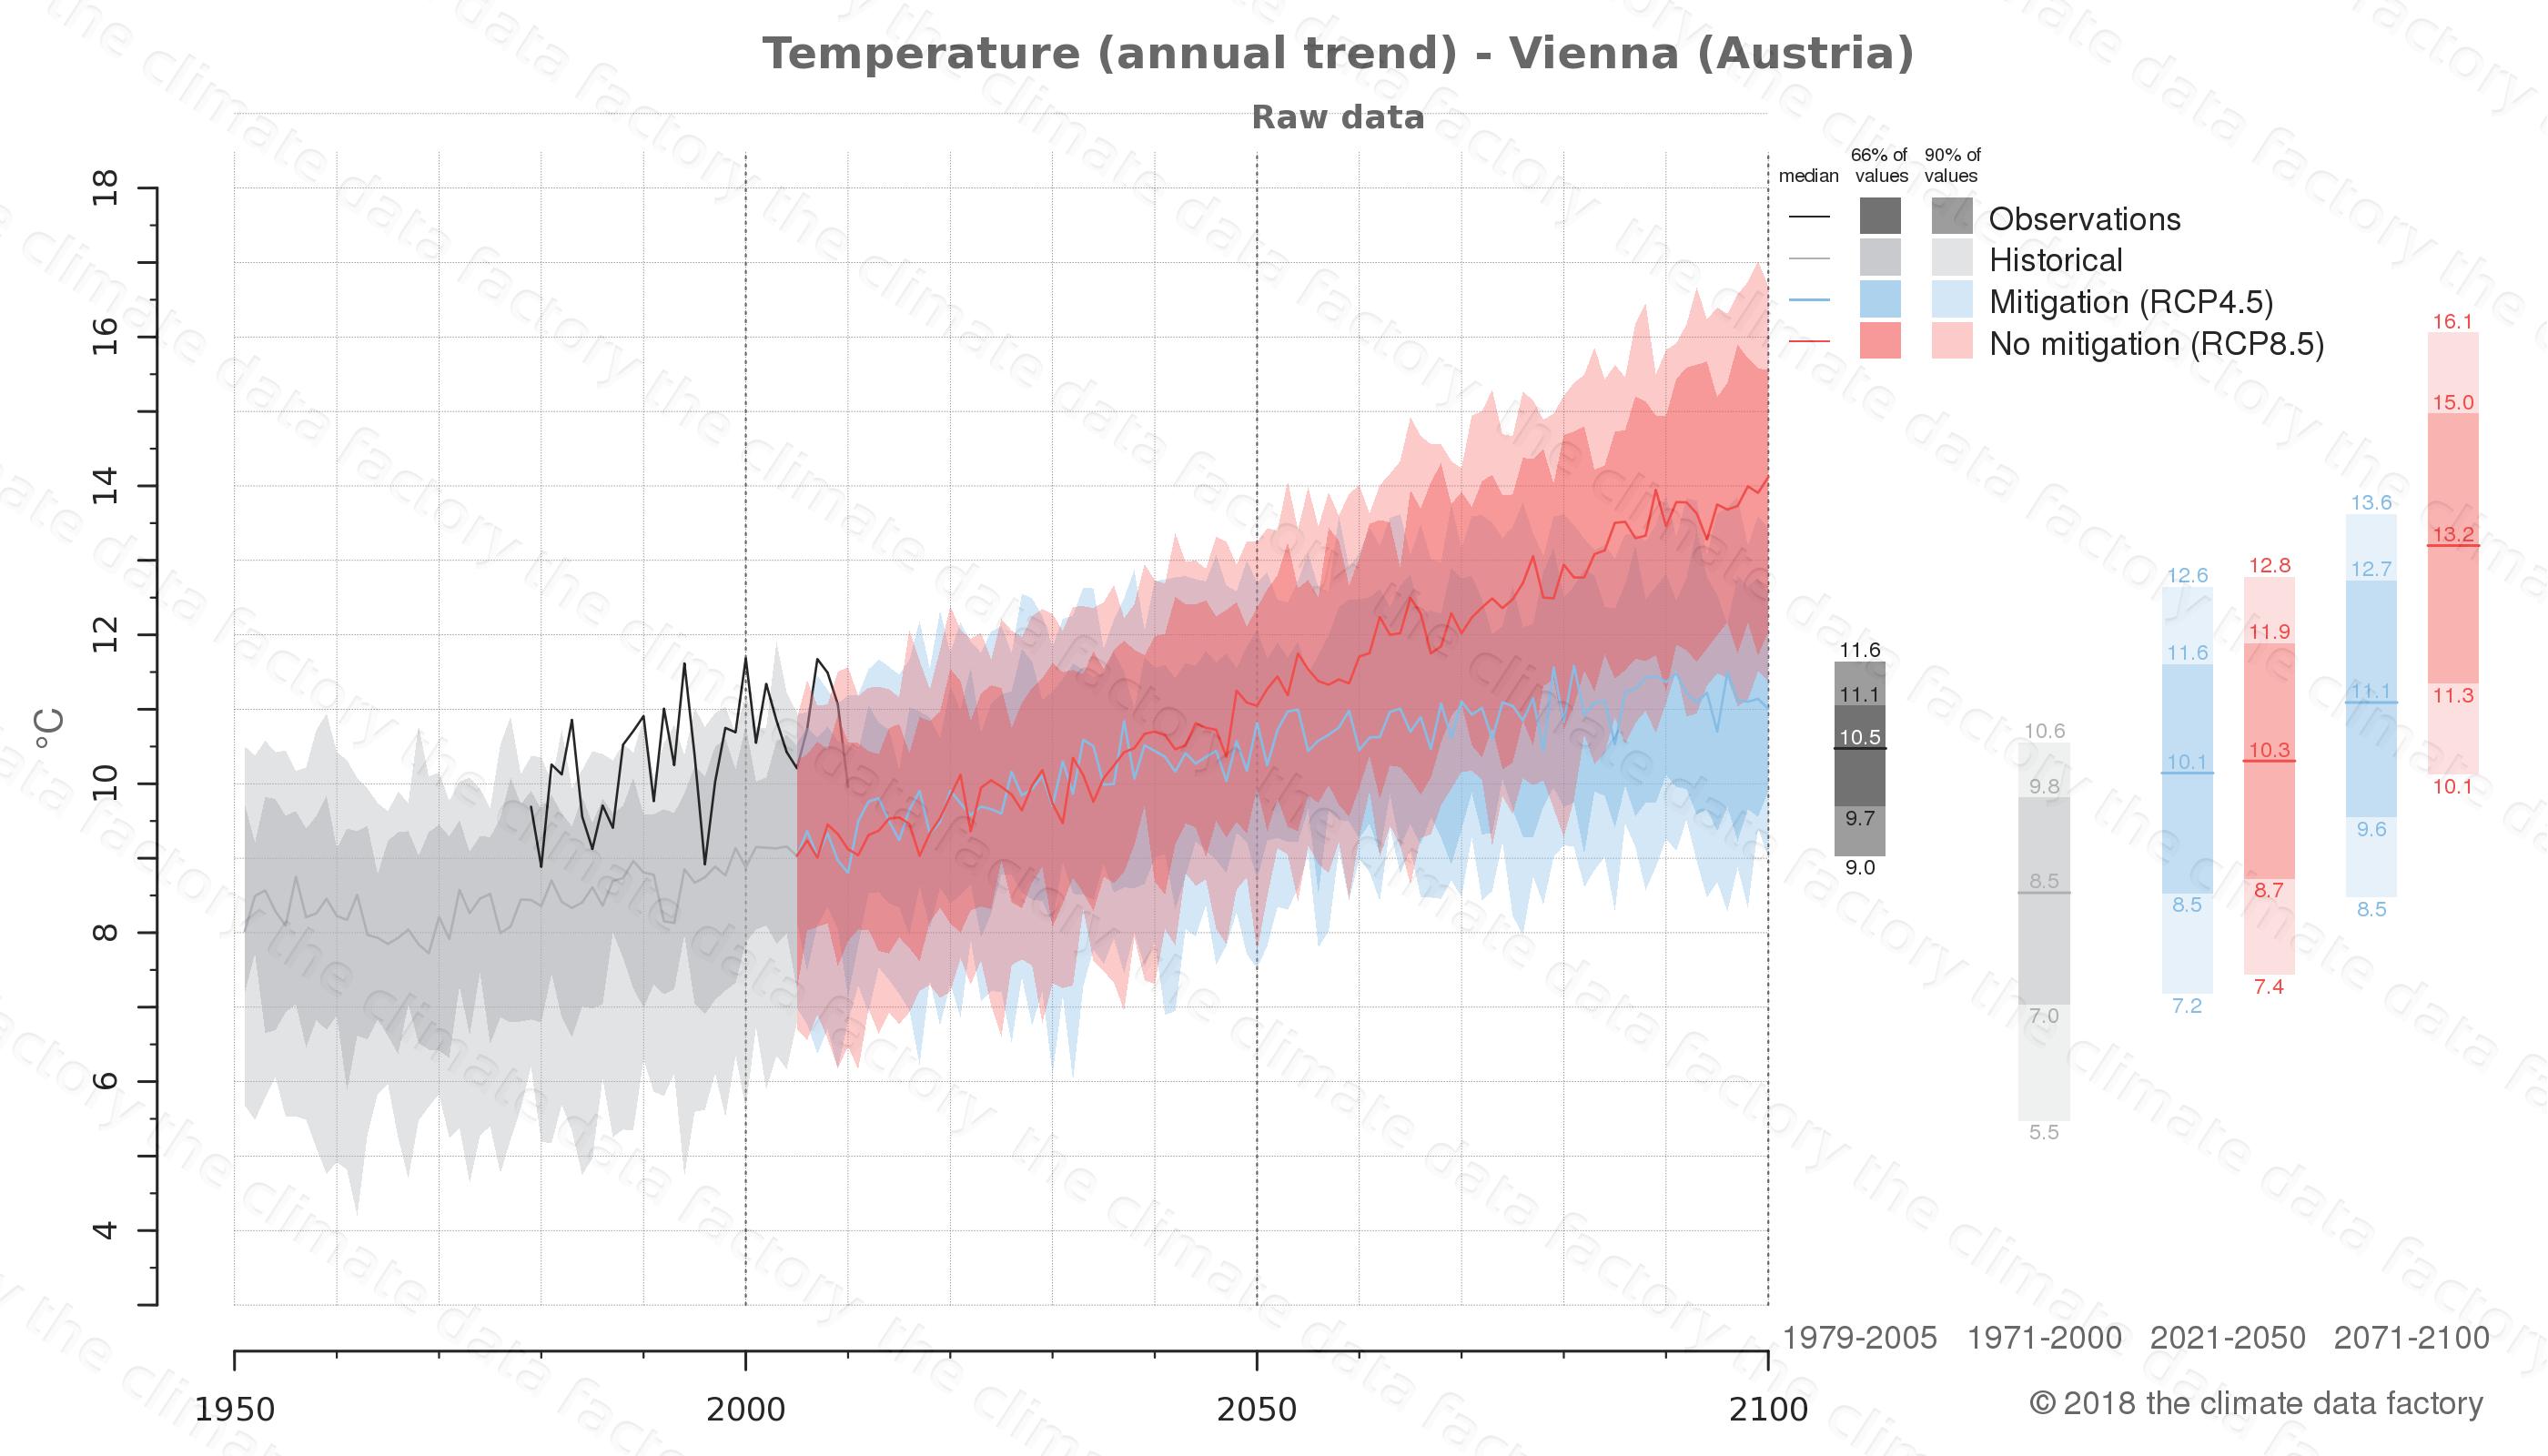 climate change data policy adaptation climate graph city data temperature vienna austria